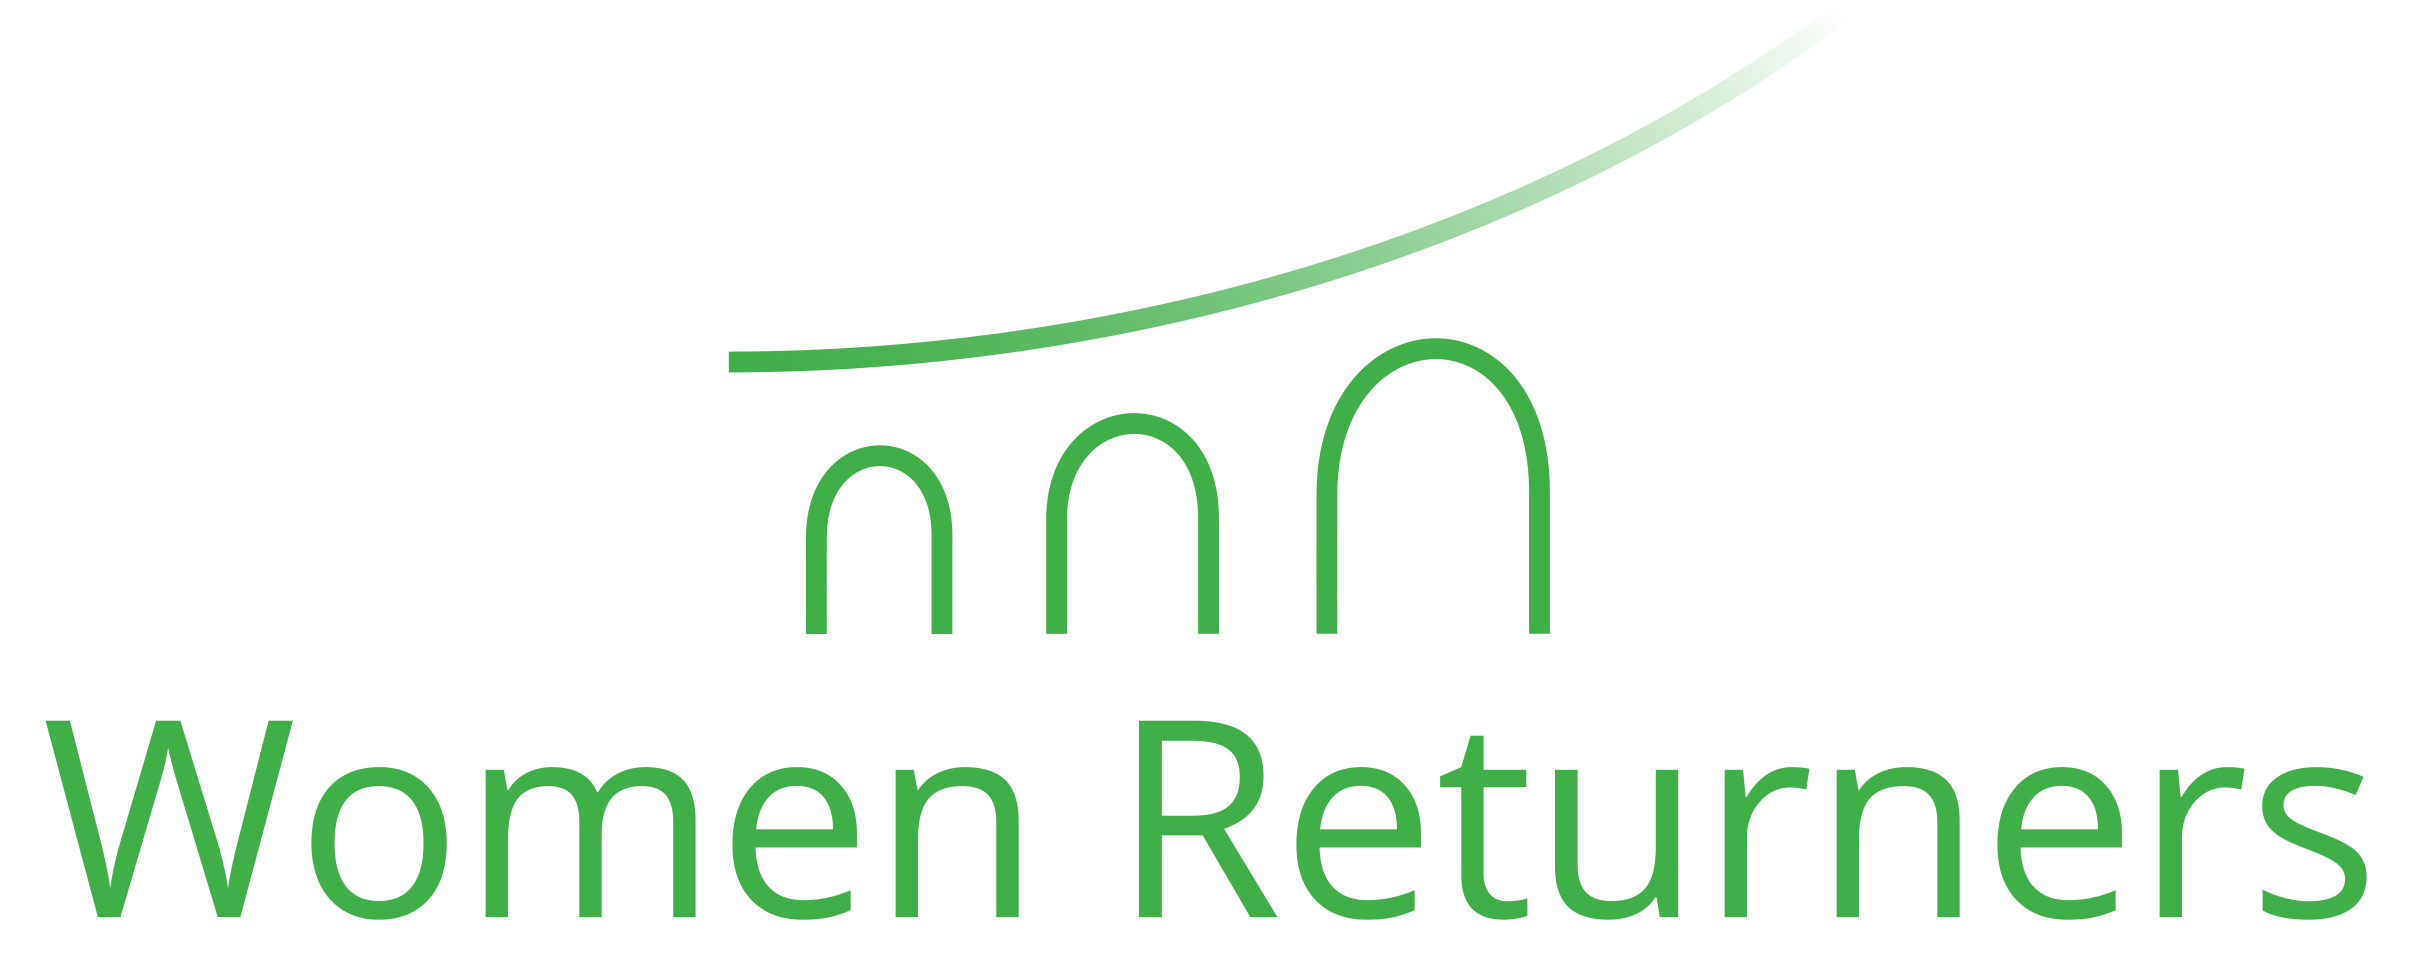 Women returners bridge logo